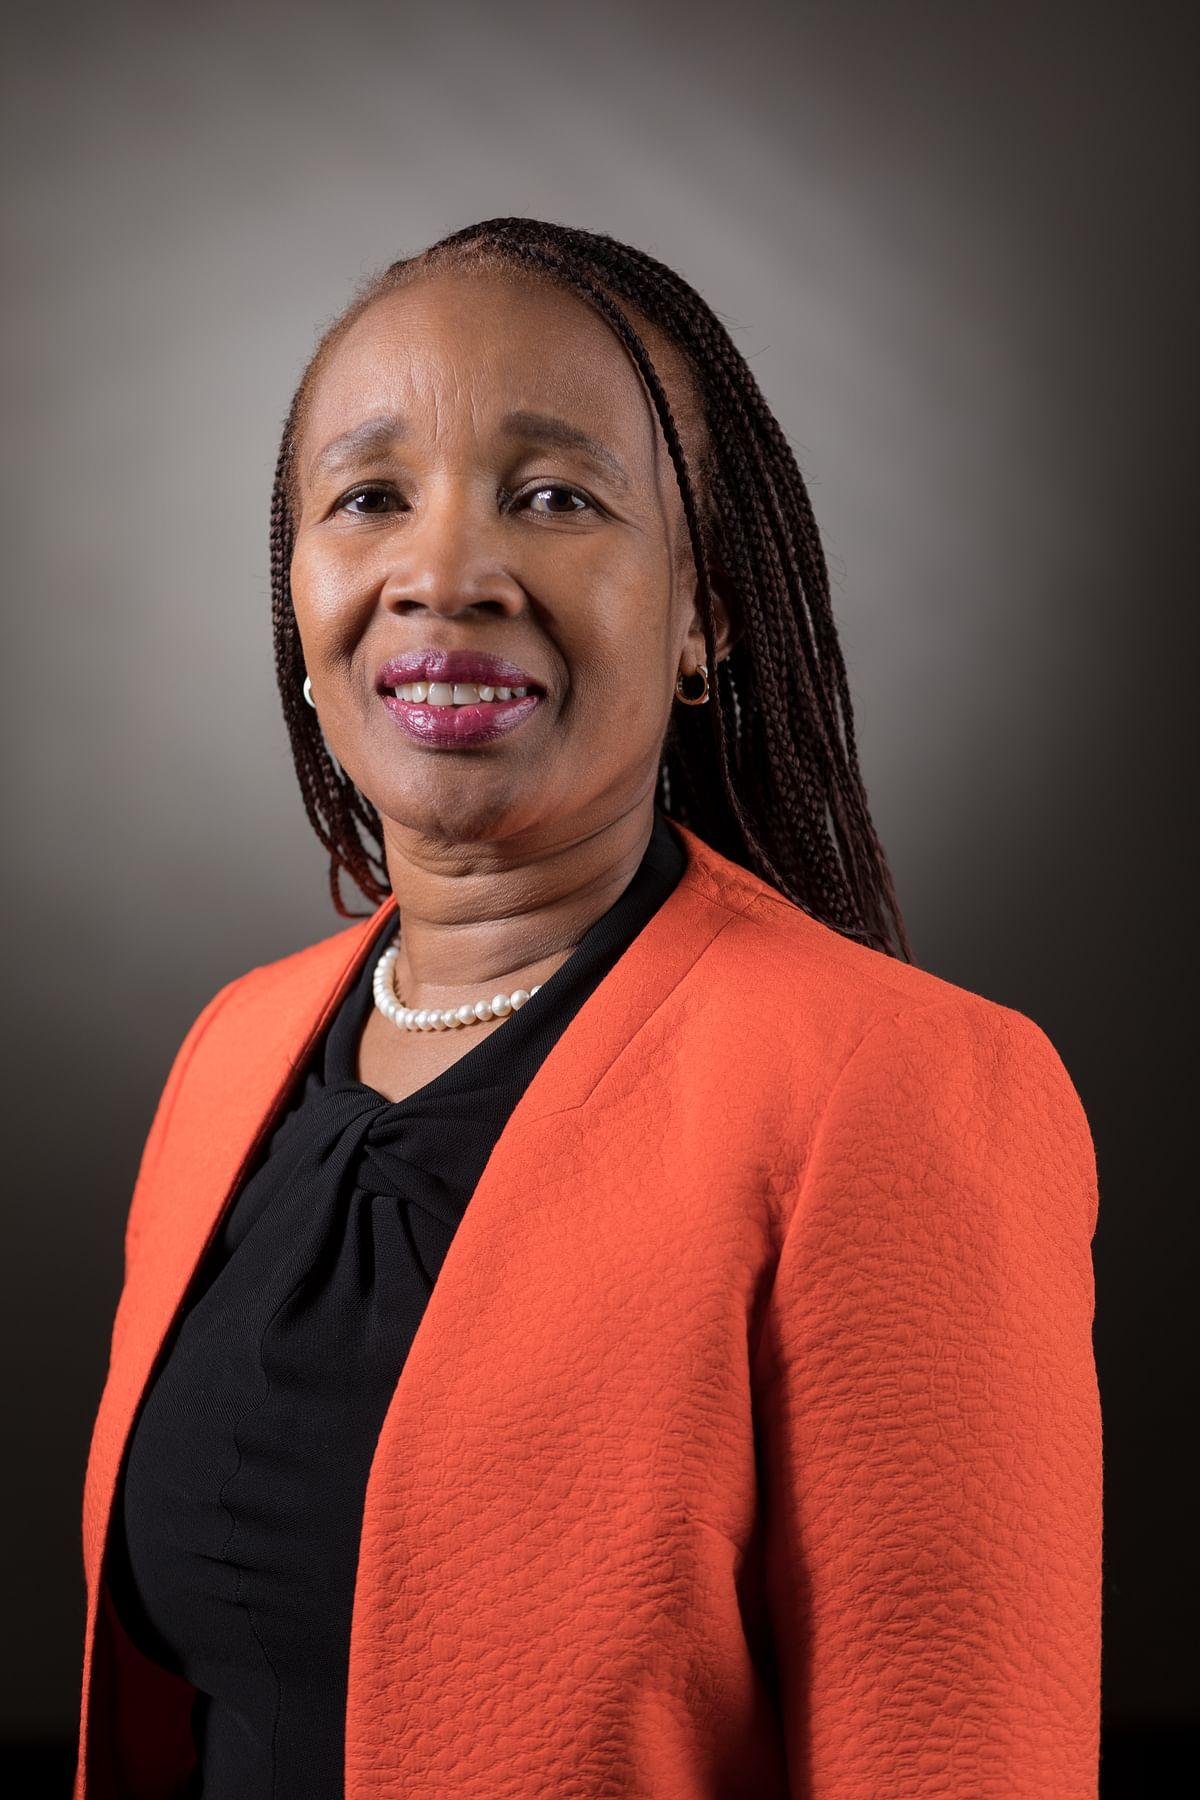 Botswana Life Insurance Limited Executive Head - People Management, Ms. Tlotlo Mookodi